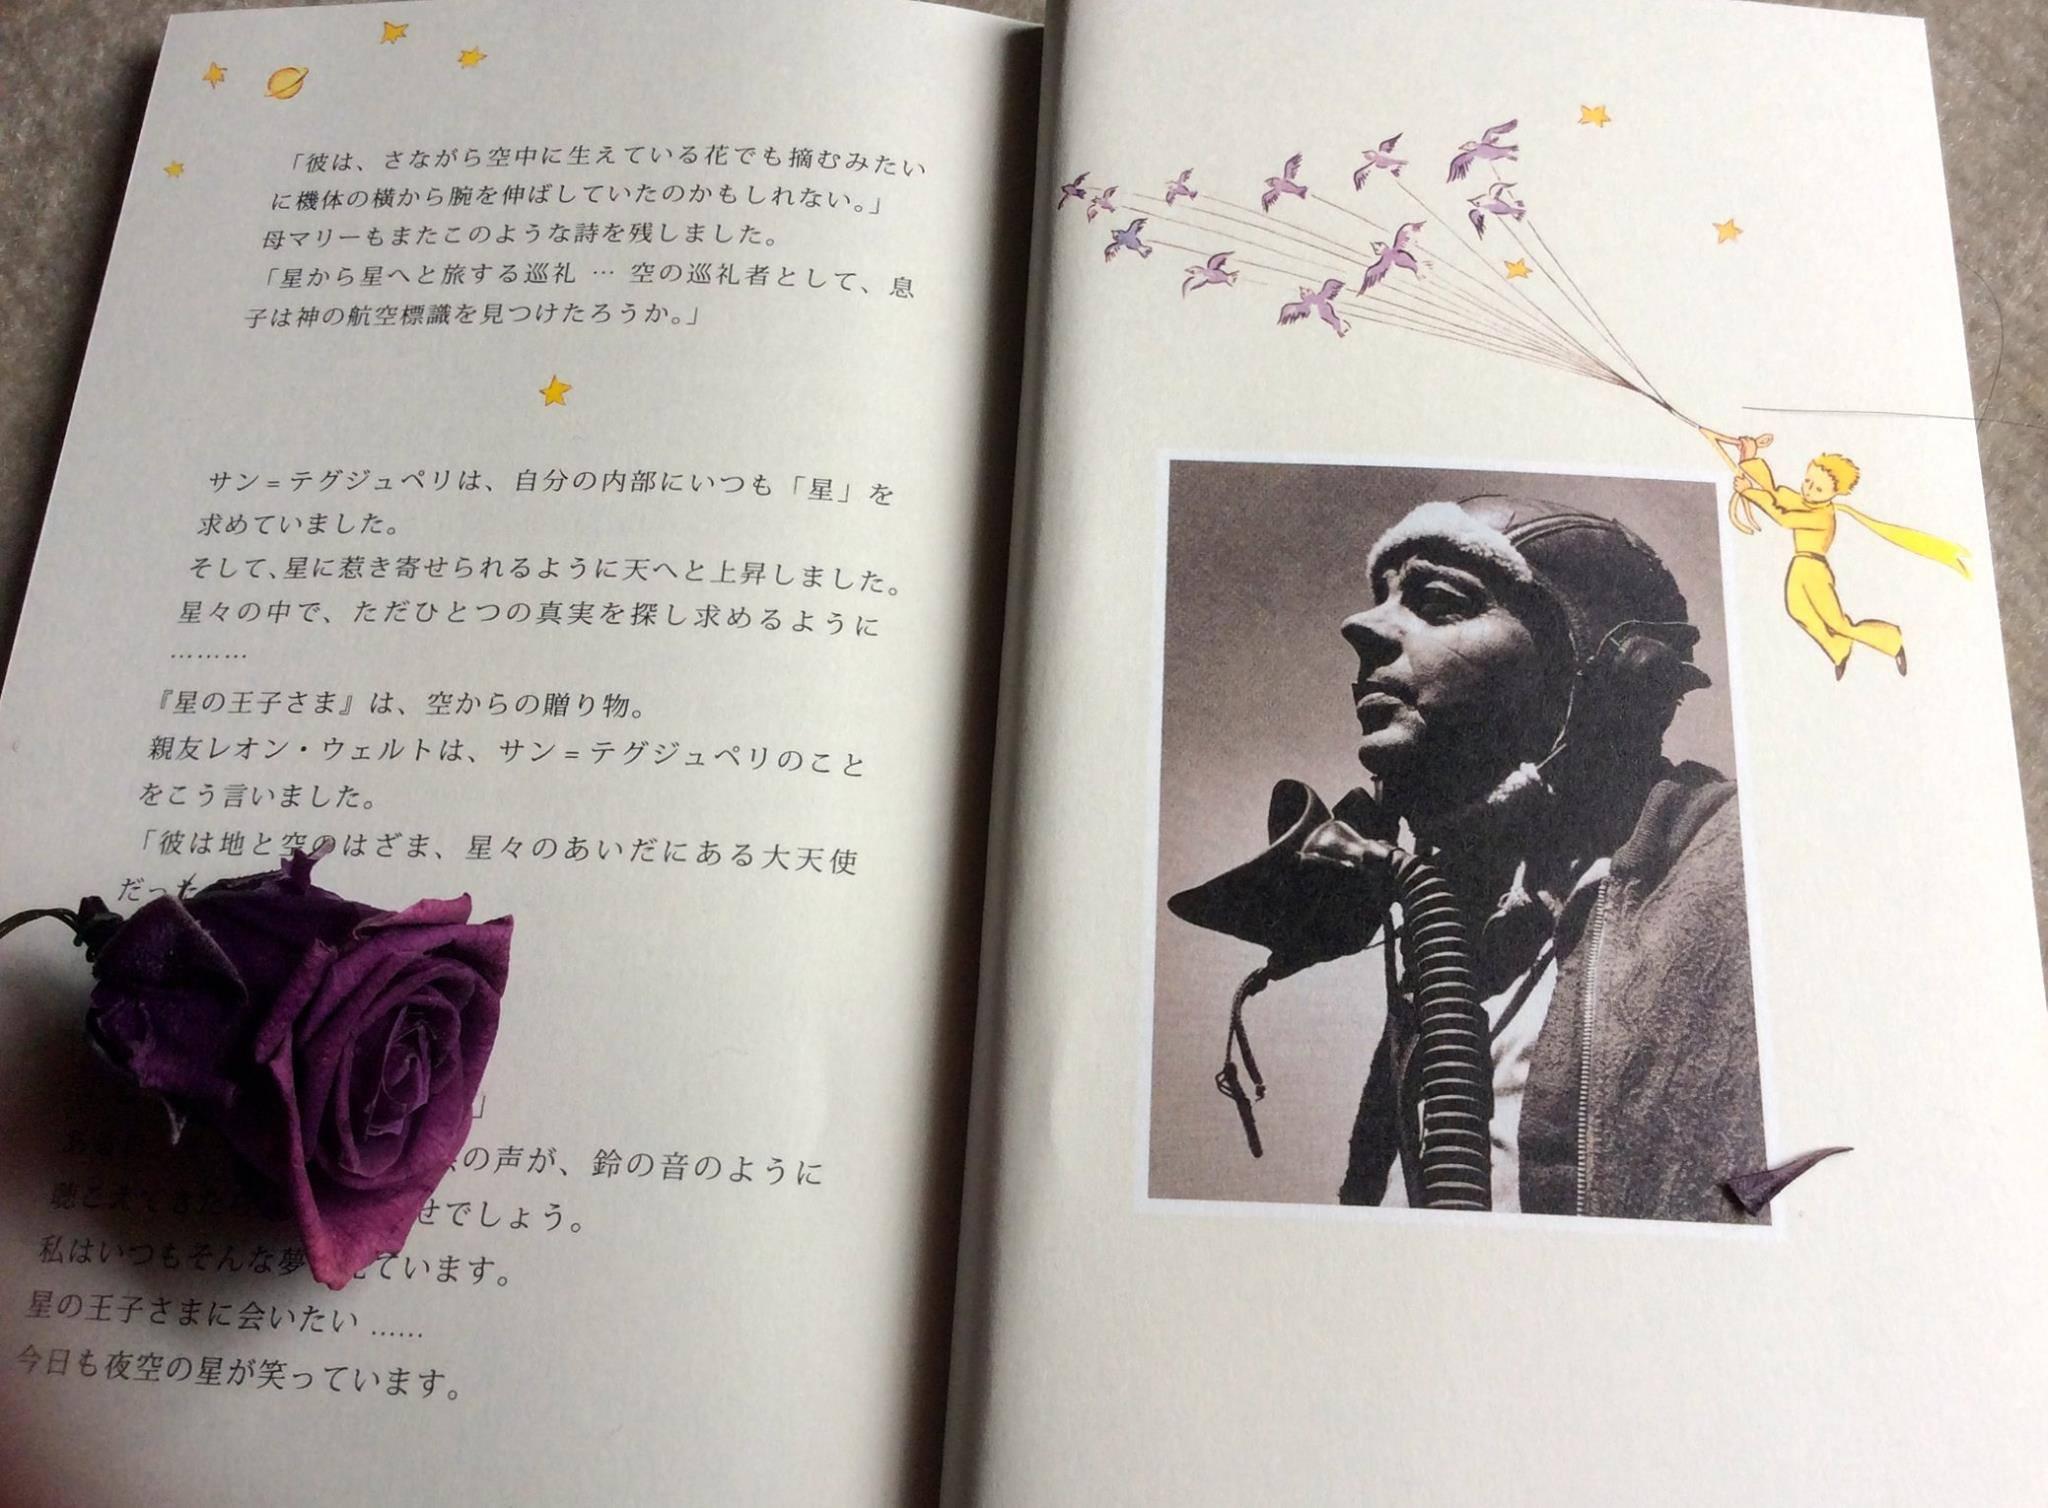 Happy birthday!サン・テクジュベリ ♡_c0203401_14231877.jpg